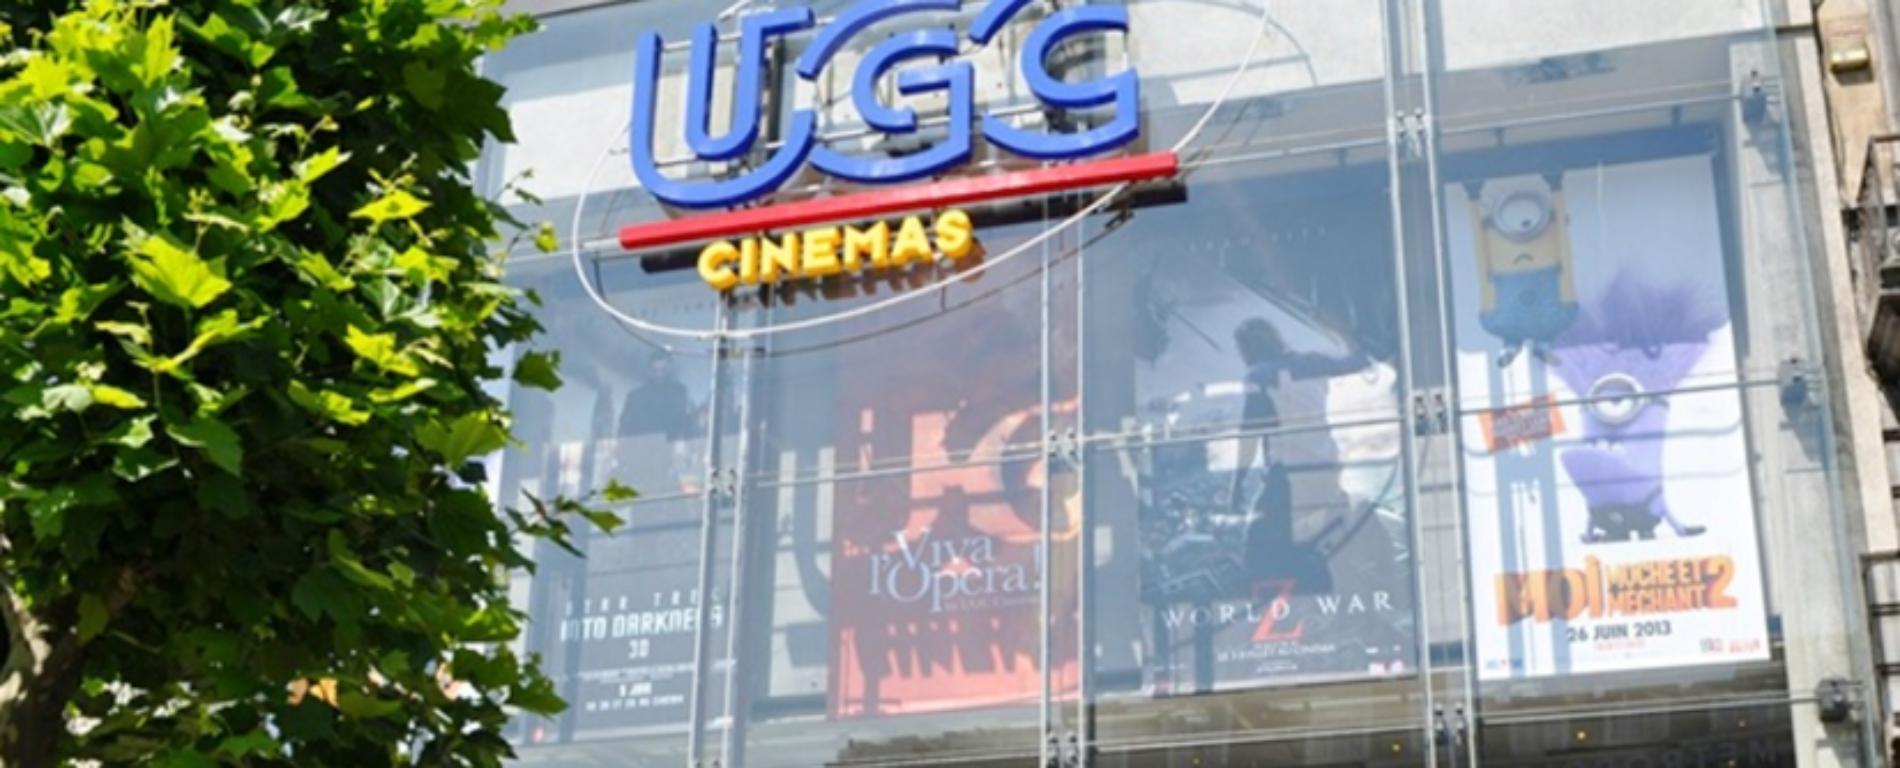 Ugc Forfait Cinéma Pcard